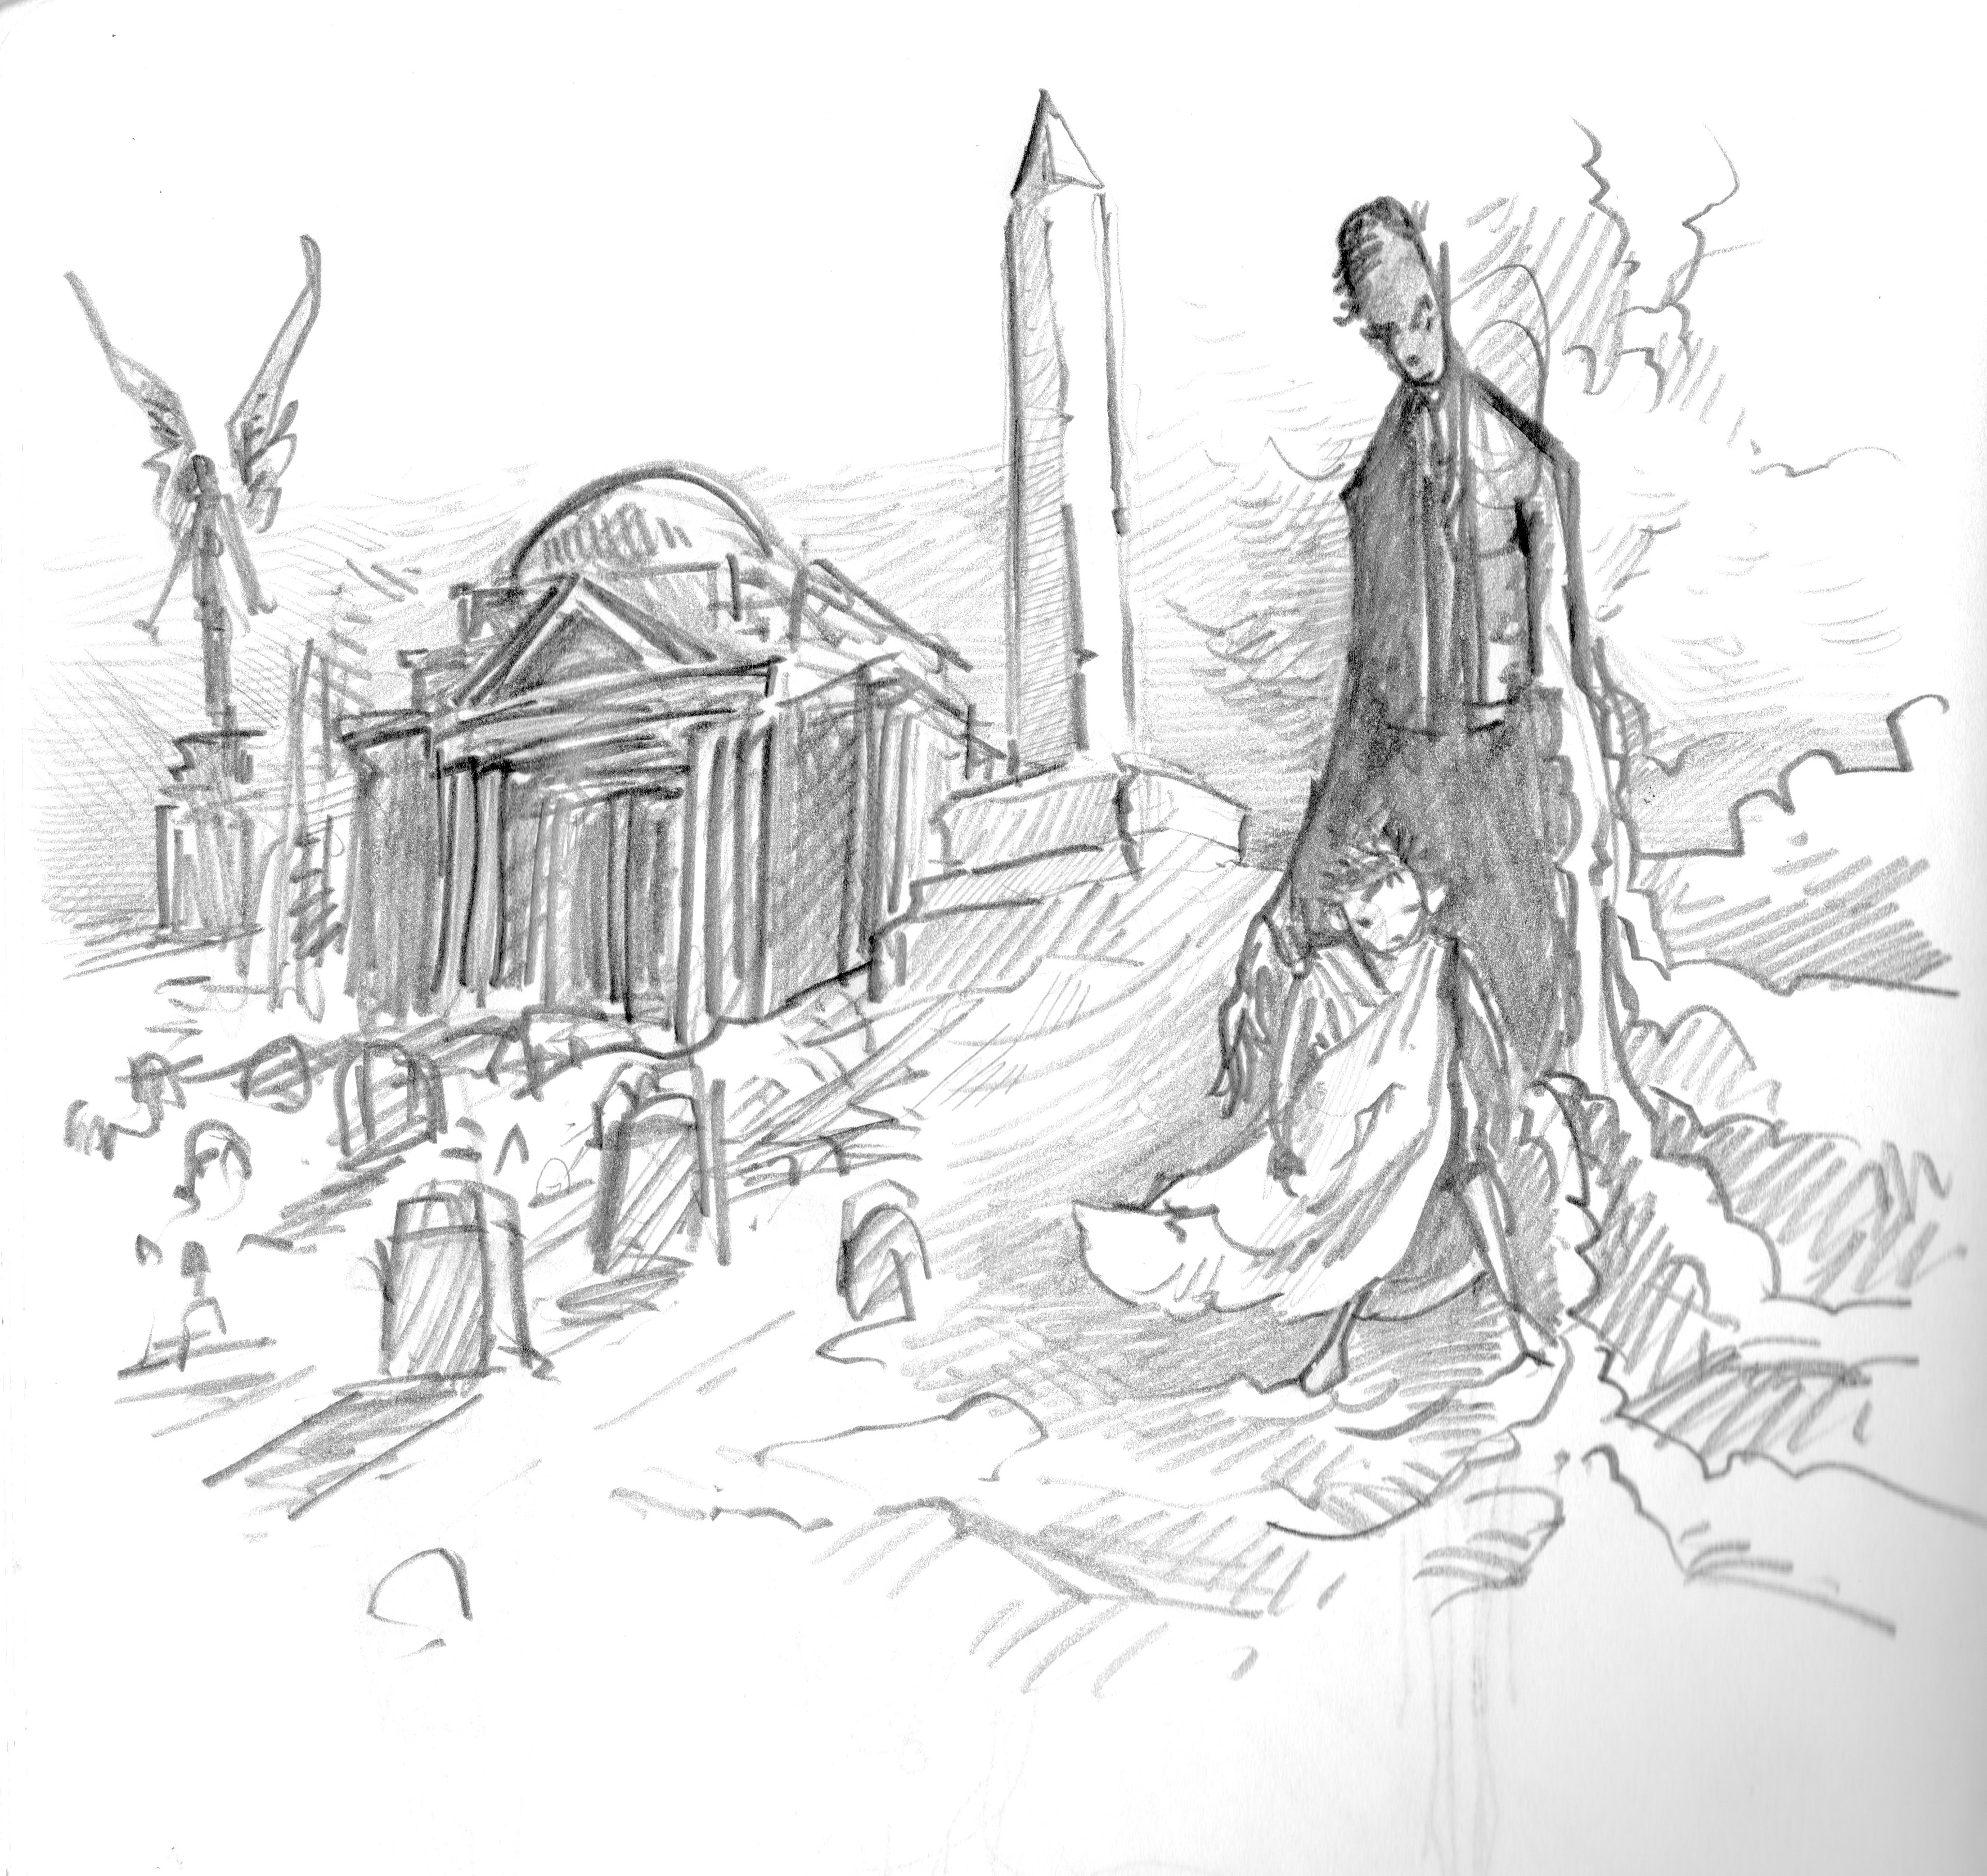 3840x3625 Neil Gaiman The Graveyard Book Drawings The Graveyard Book